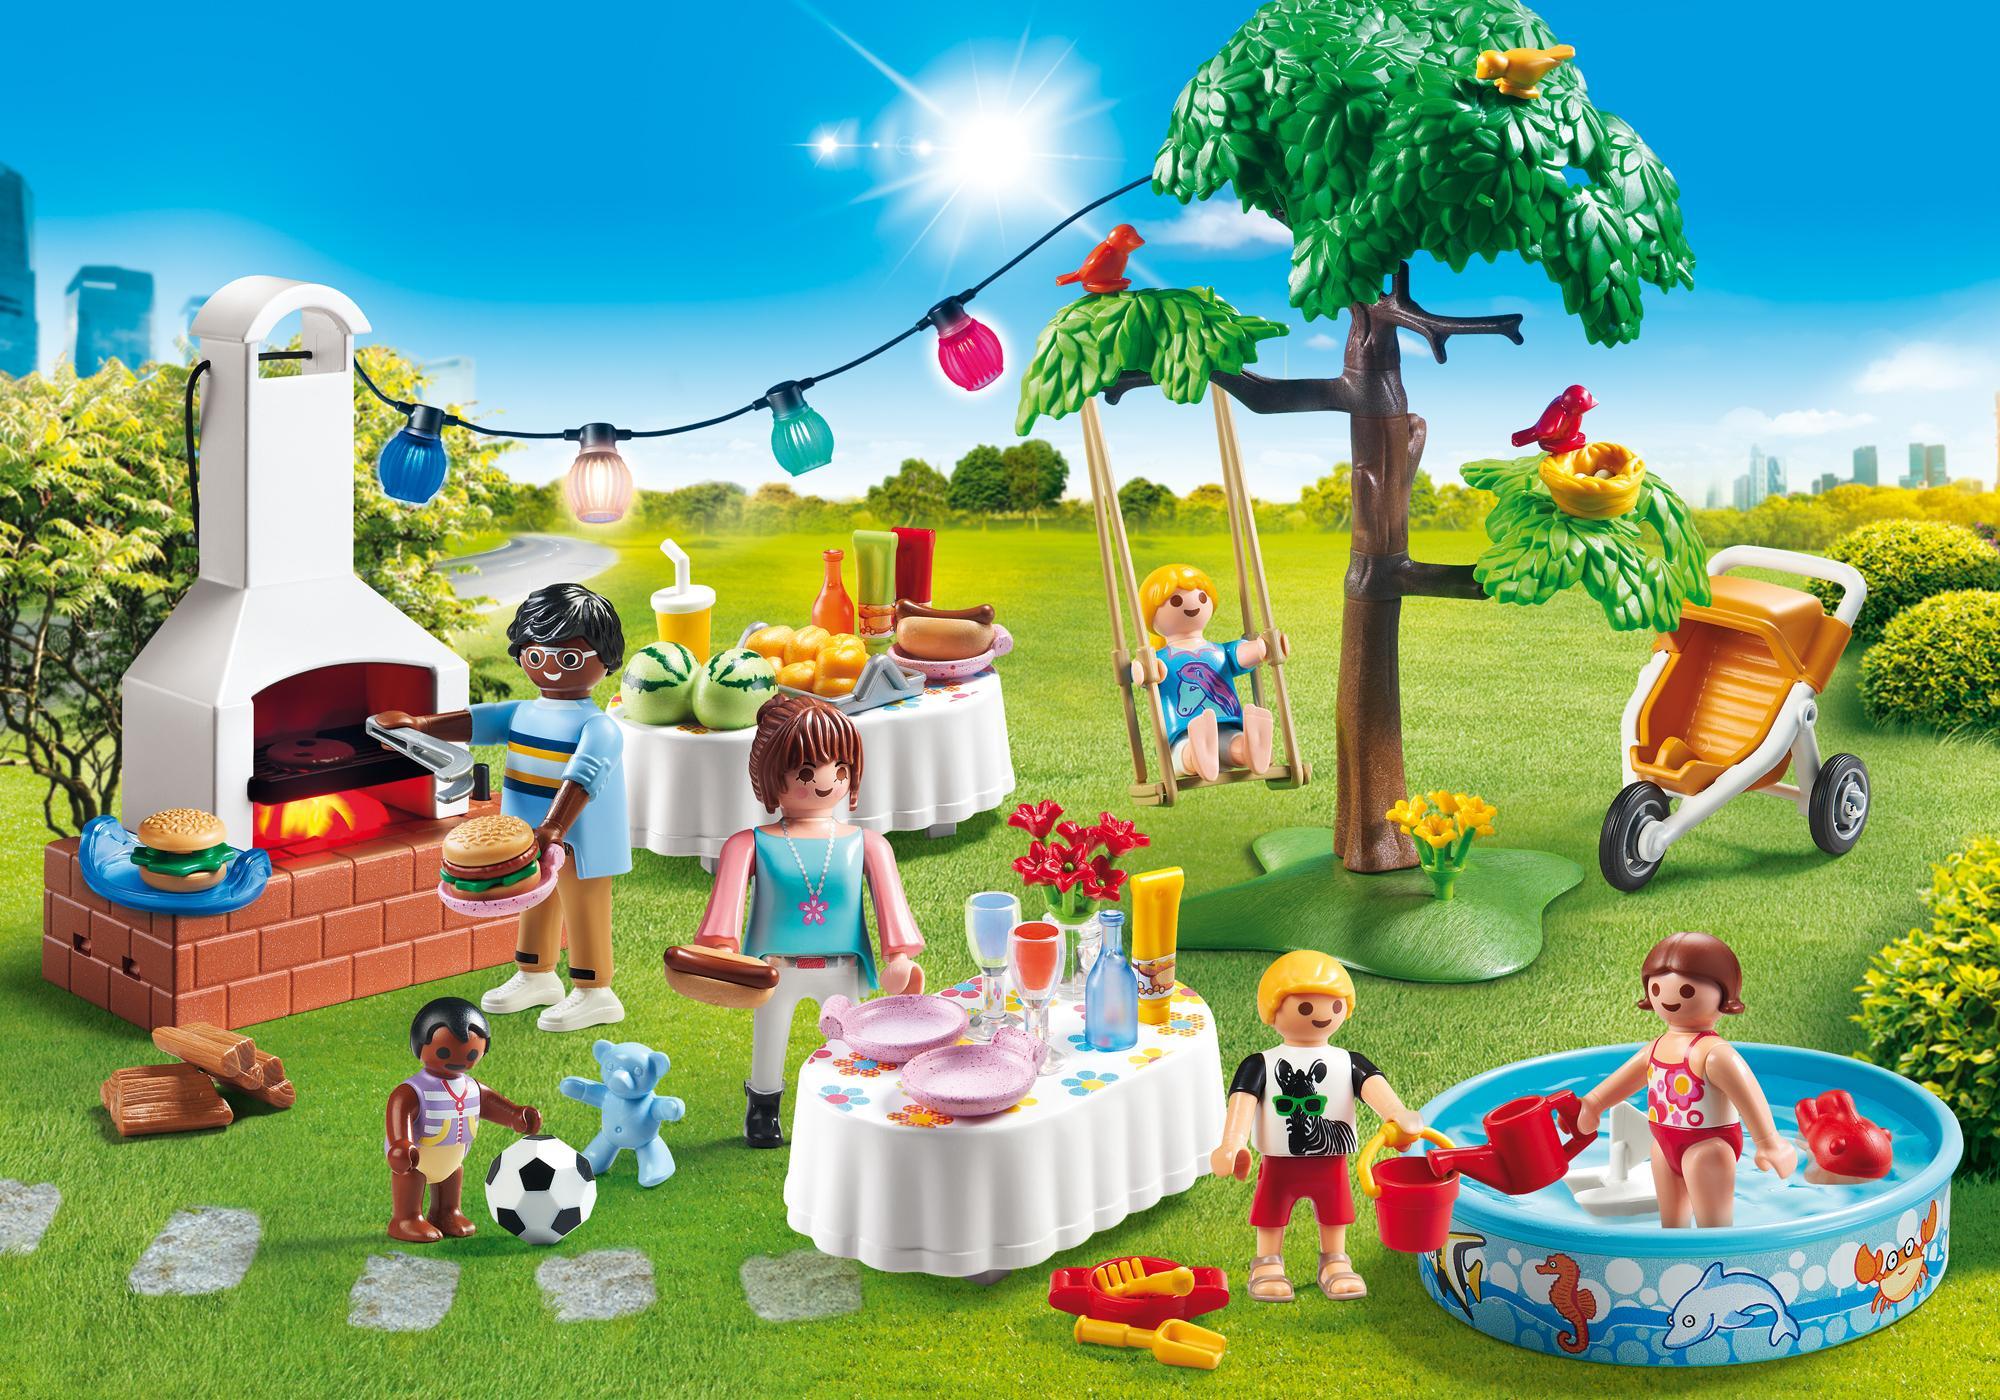 http://media.playmobil.com/i/playmobil/9272_product_detail/Famille et barbecue estival